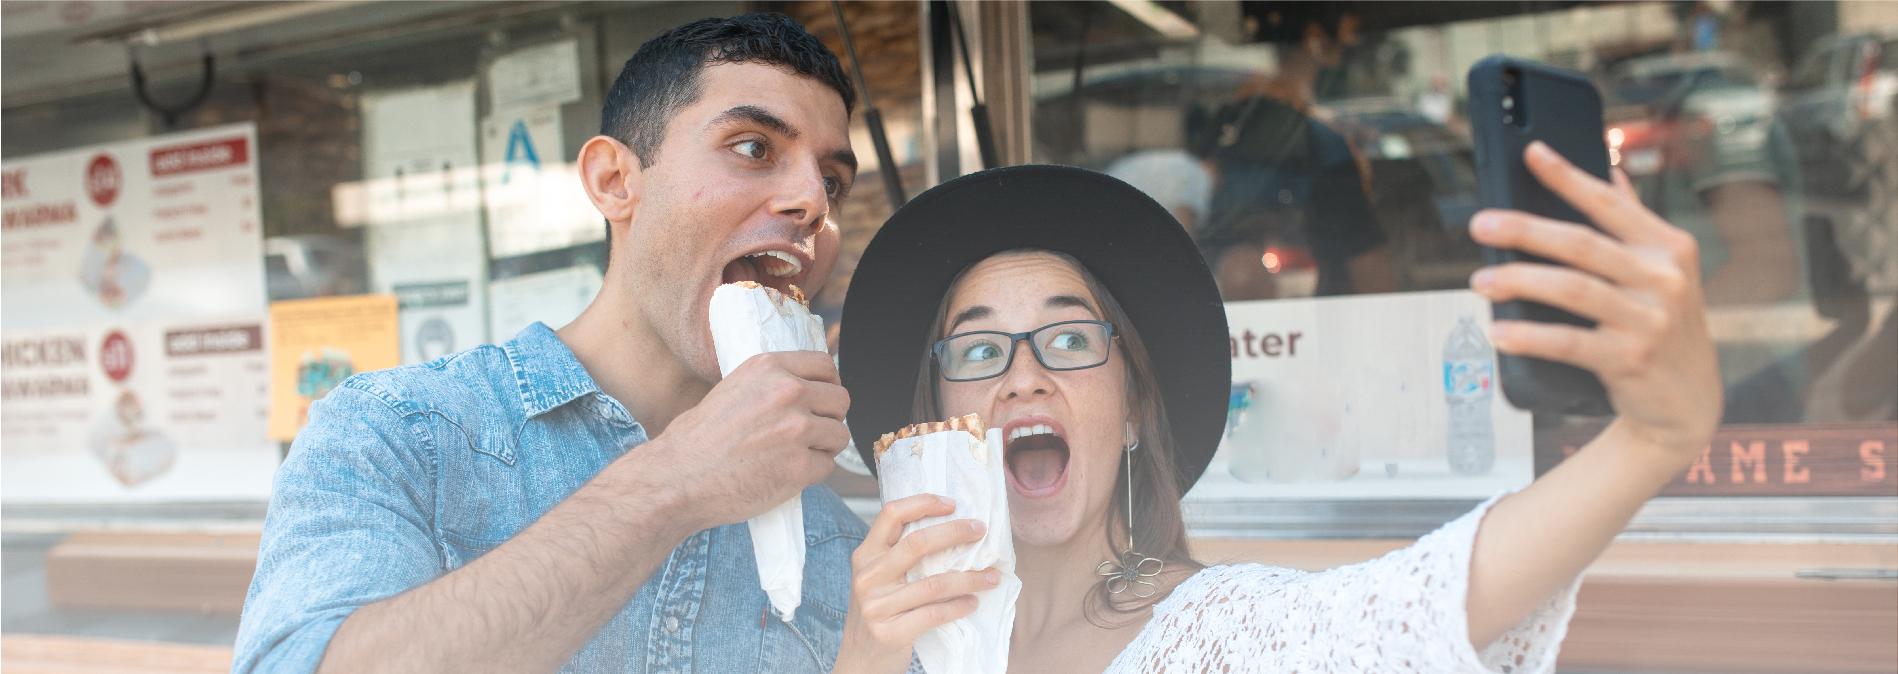 man and woman eating mobile street food